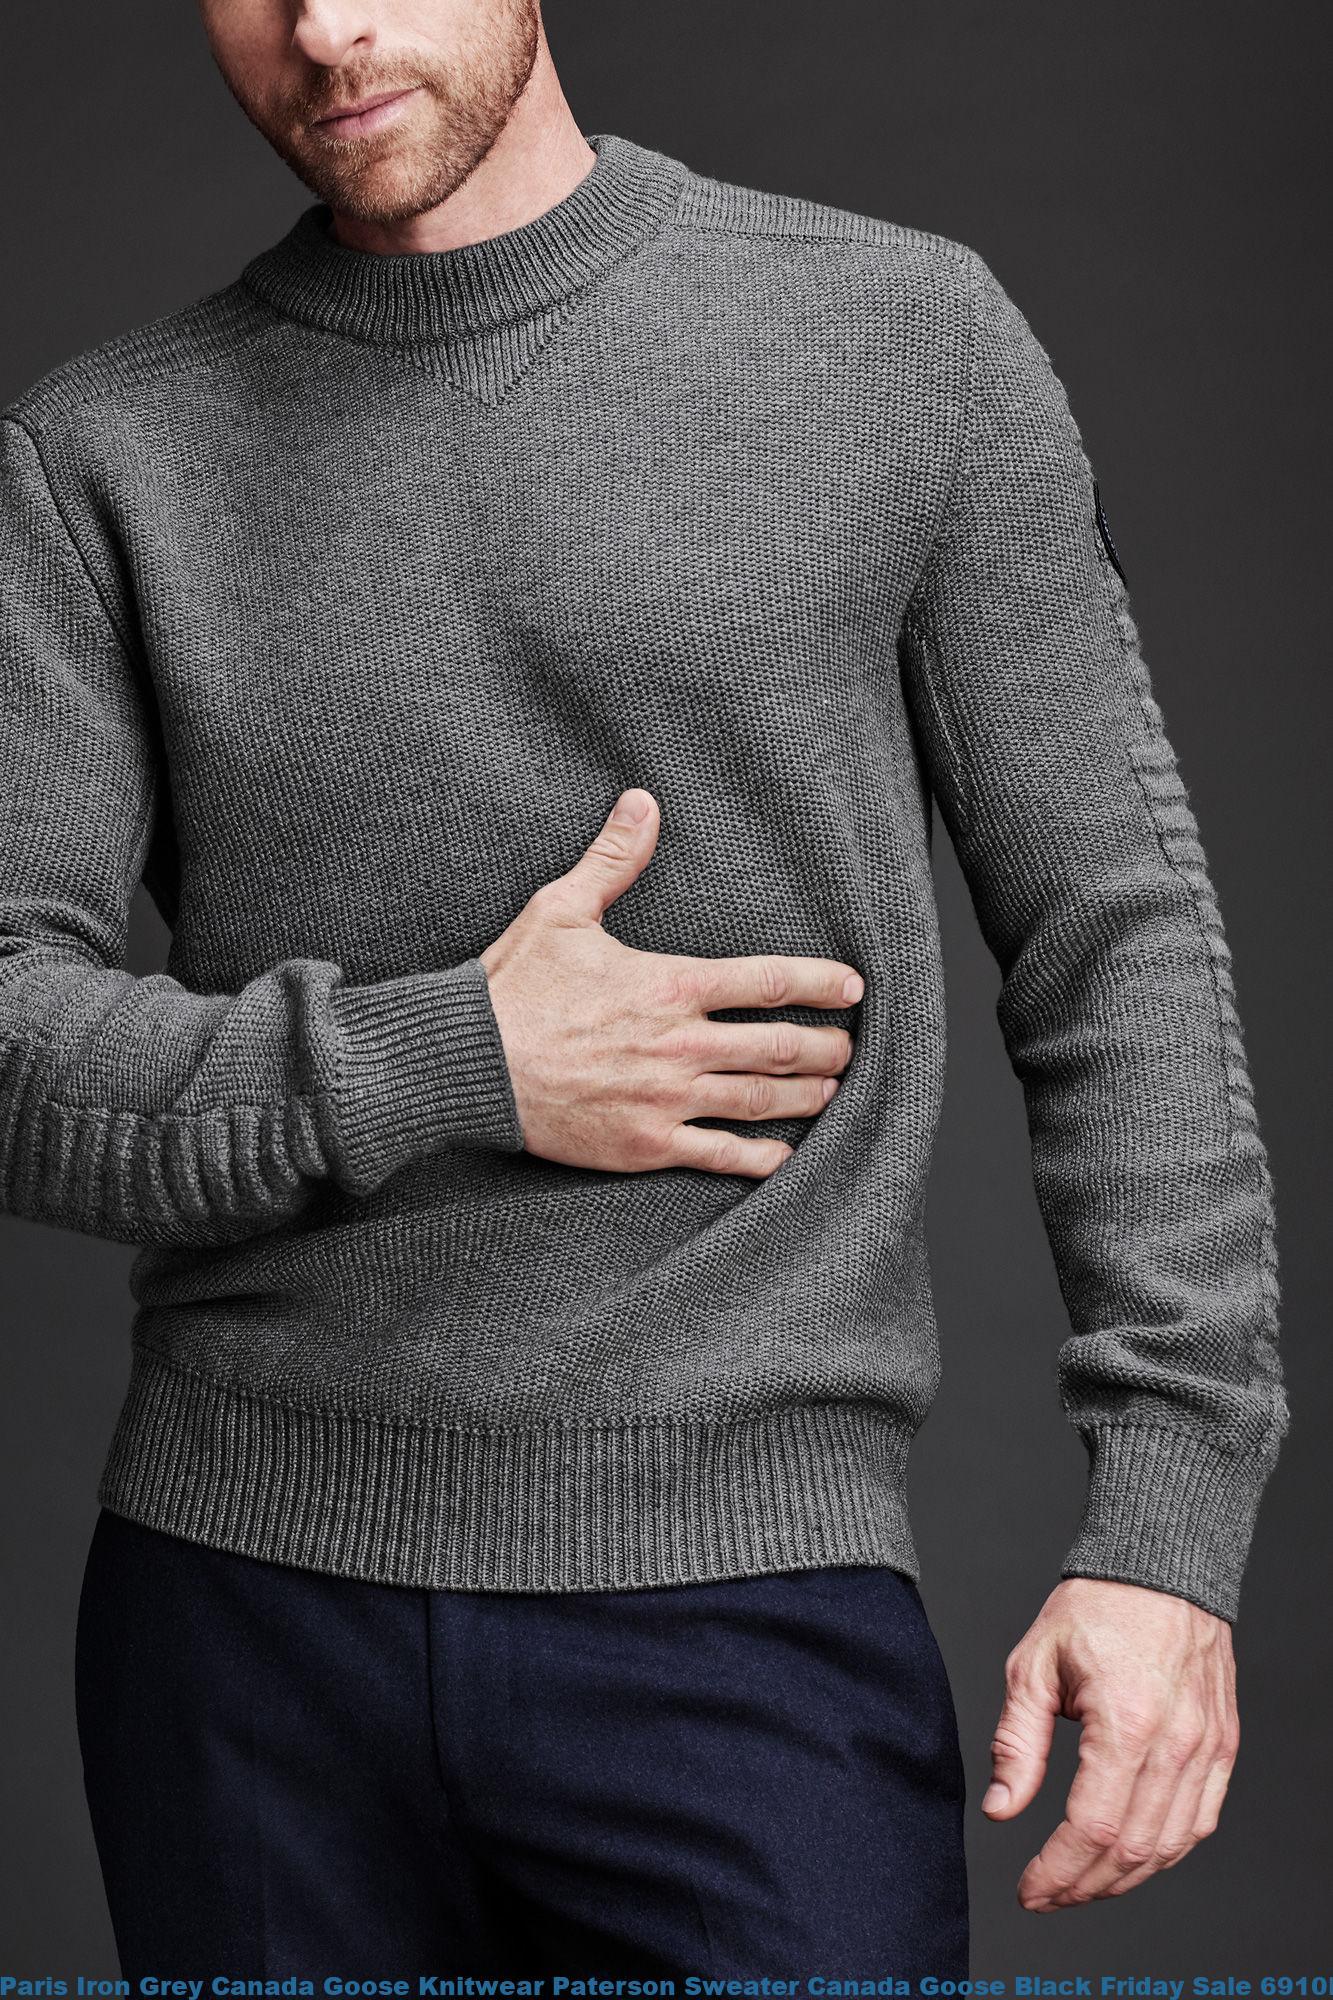 Knitwear Fashion Trend, Autumn/Winter 2014 - Just The Design